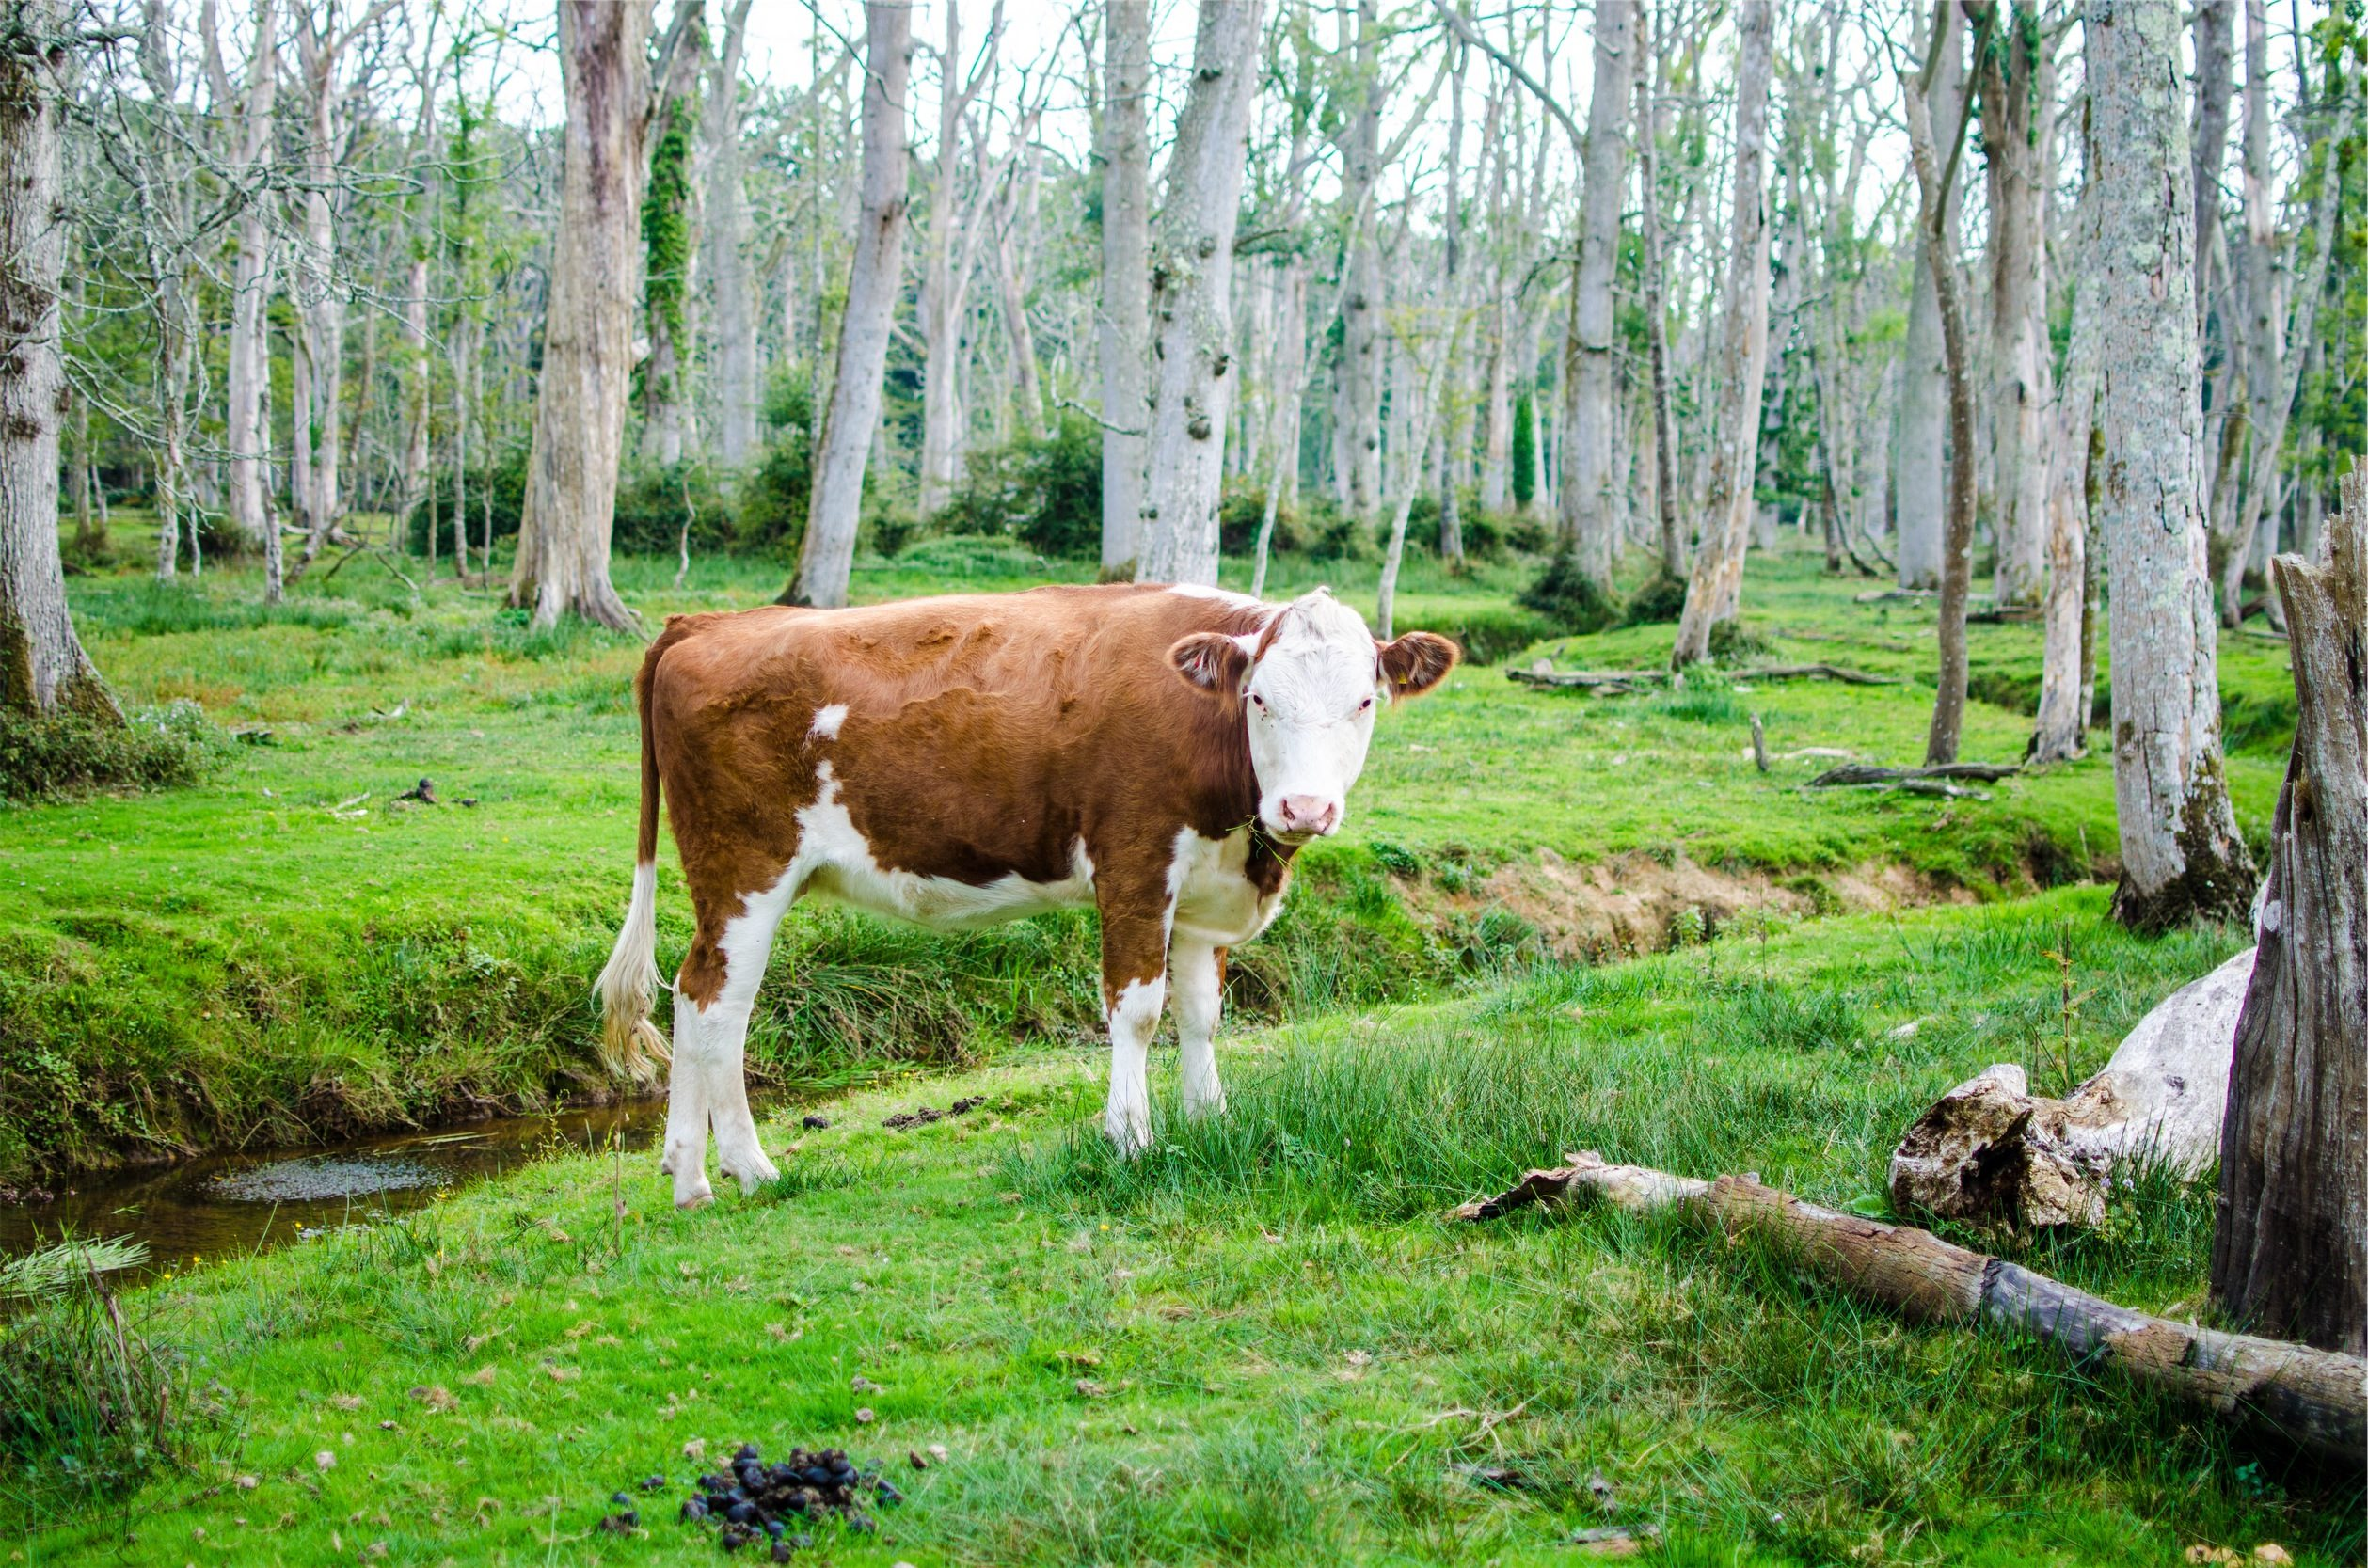 vaca, ternera, 森林, 看看, 树木 - 高清壁纸 - 教授-falken.com